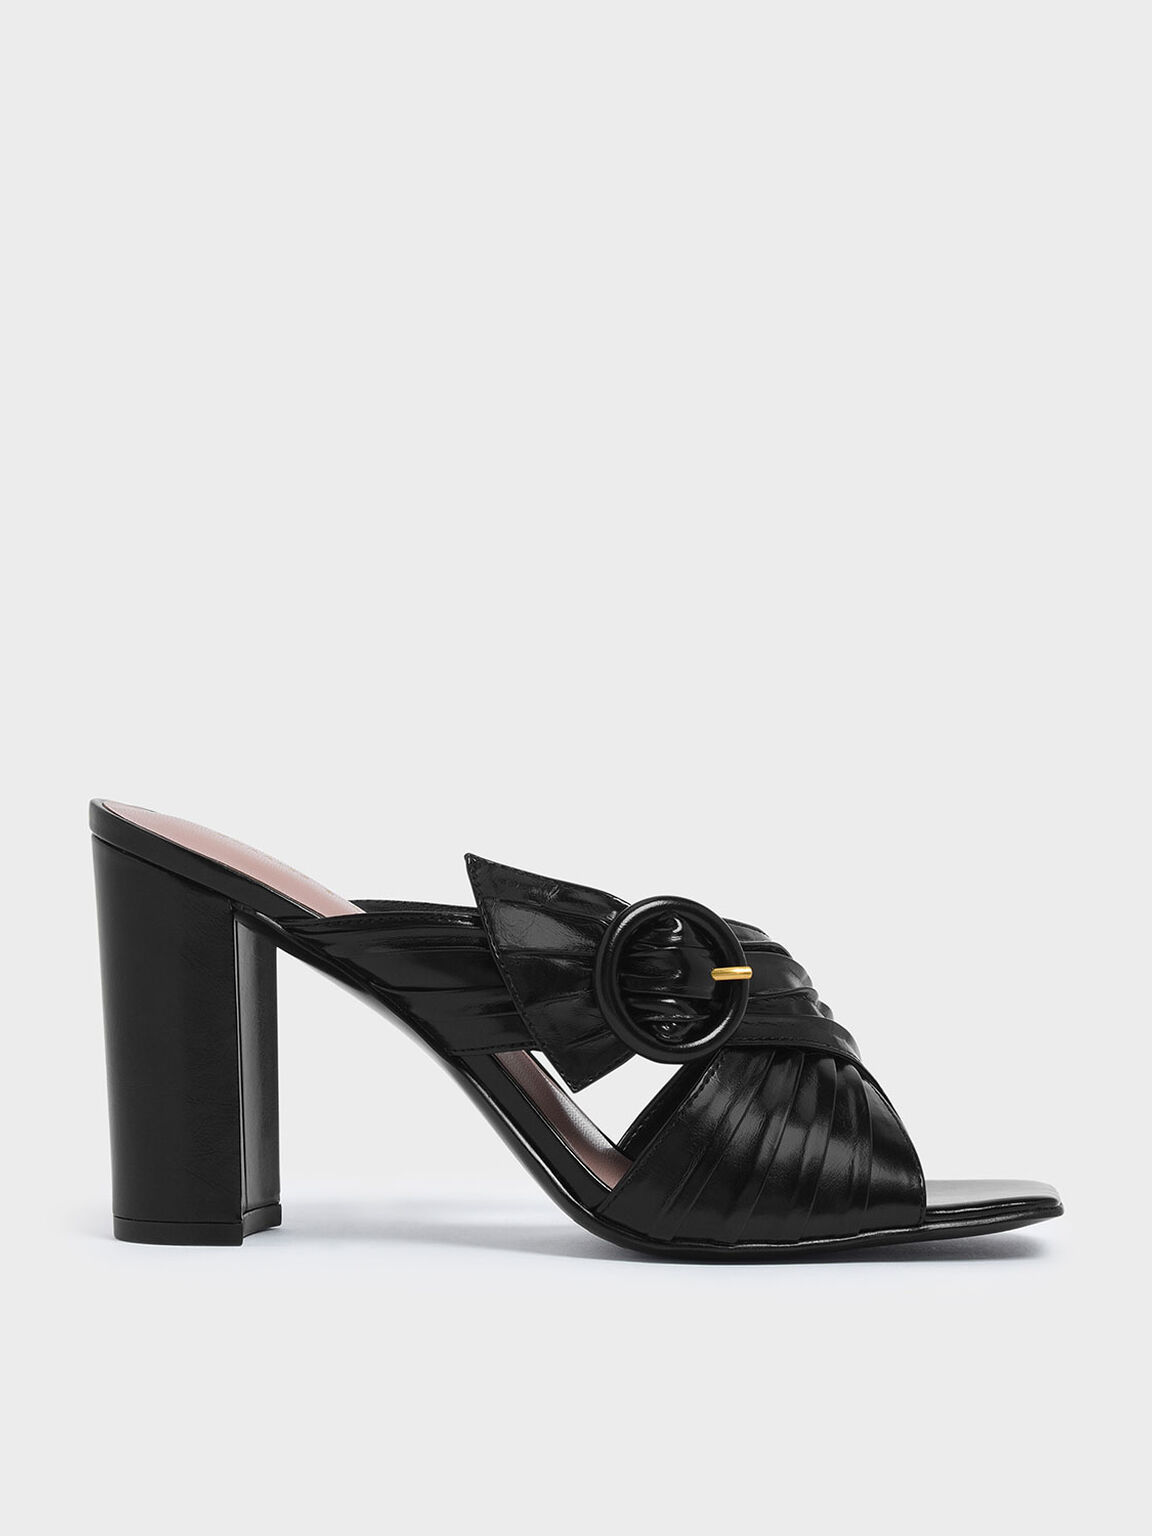 Criss Cross Pleated Buckle Strap Heeled Slide Sandals, Black, hi-res